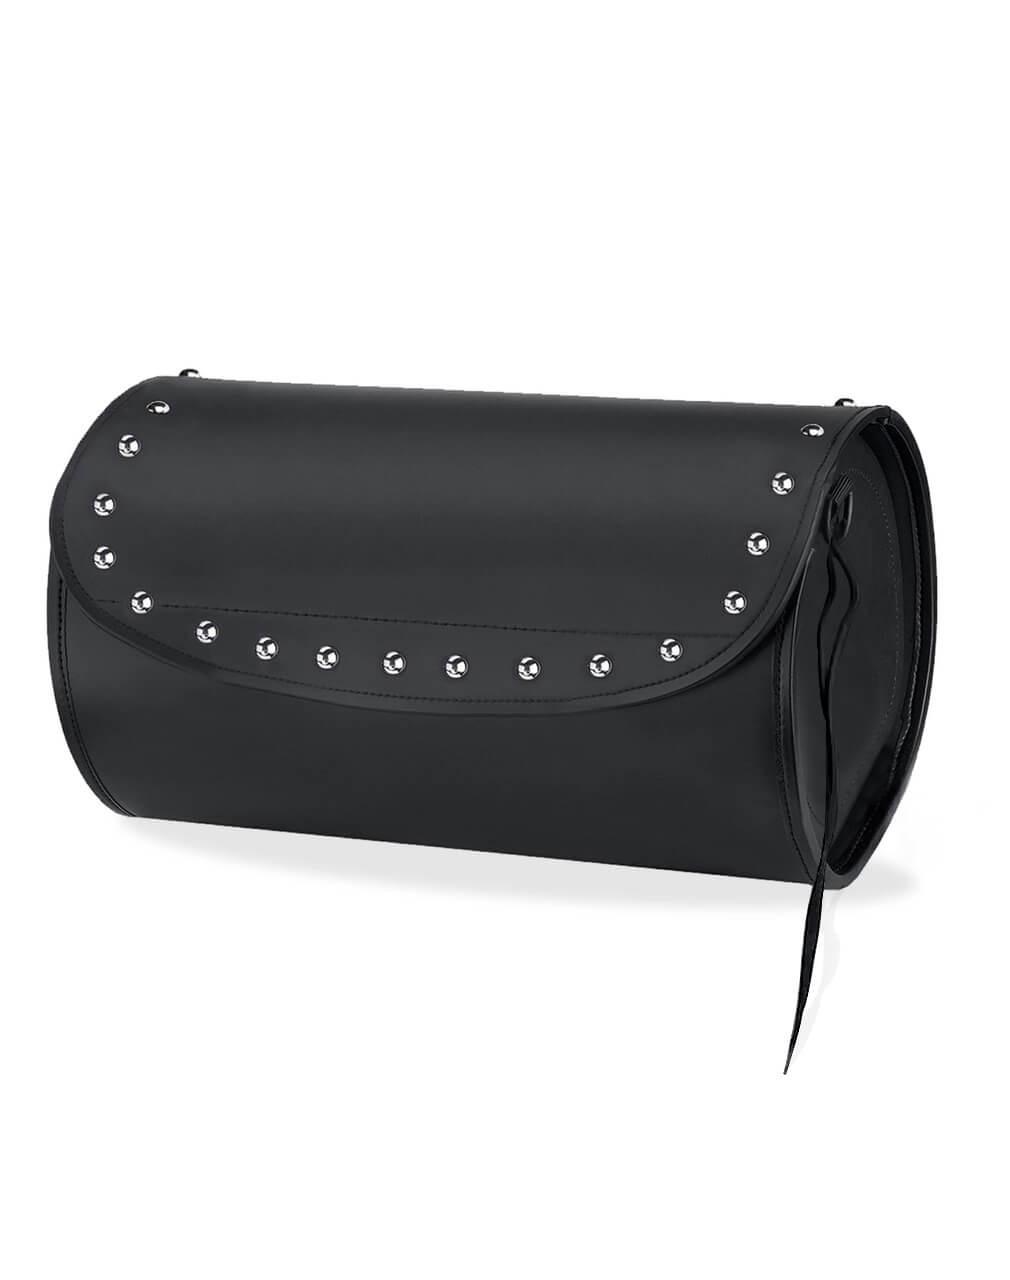 Honda Viking Revival Series Studded Motorcycle Sissy Bar Bag Roll Bag